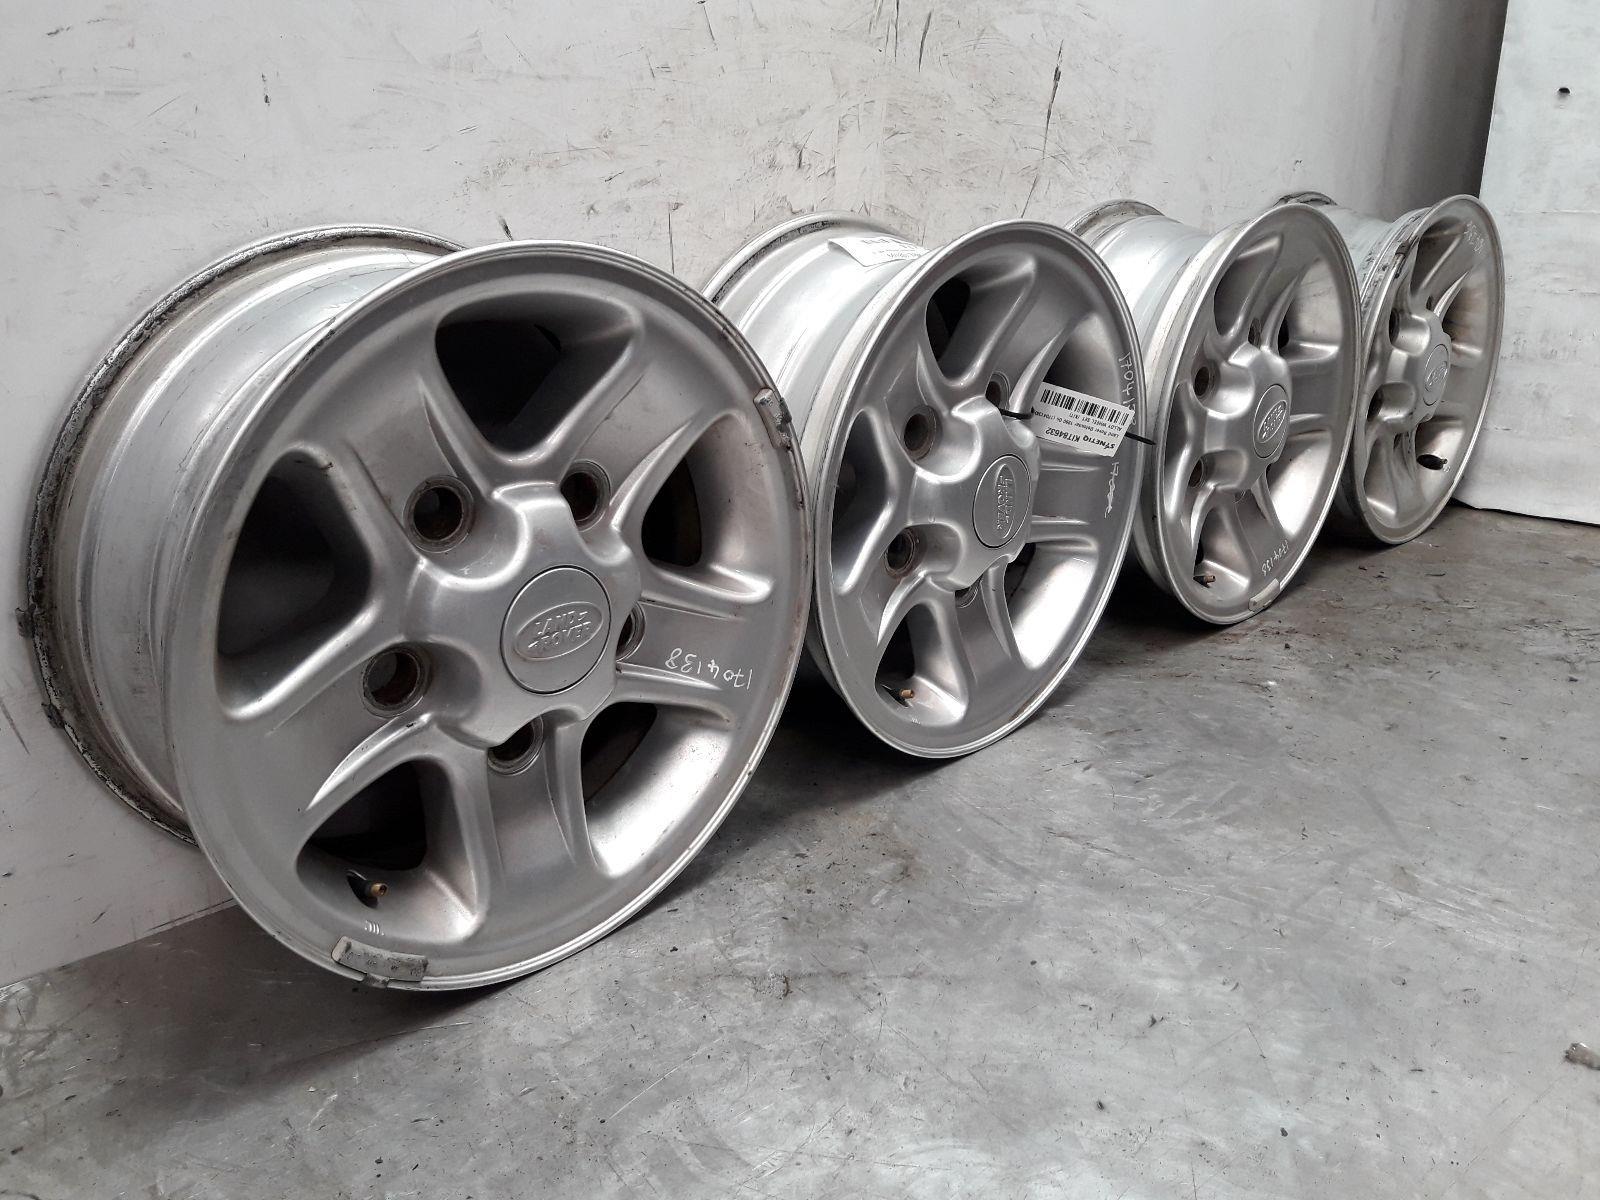 Set Of Genuine 16 Inch LAND ROVER DEFENDER Alloy Wheels Rims 7x16 ET33